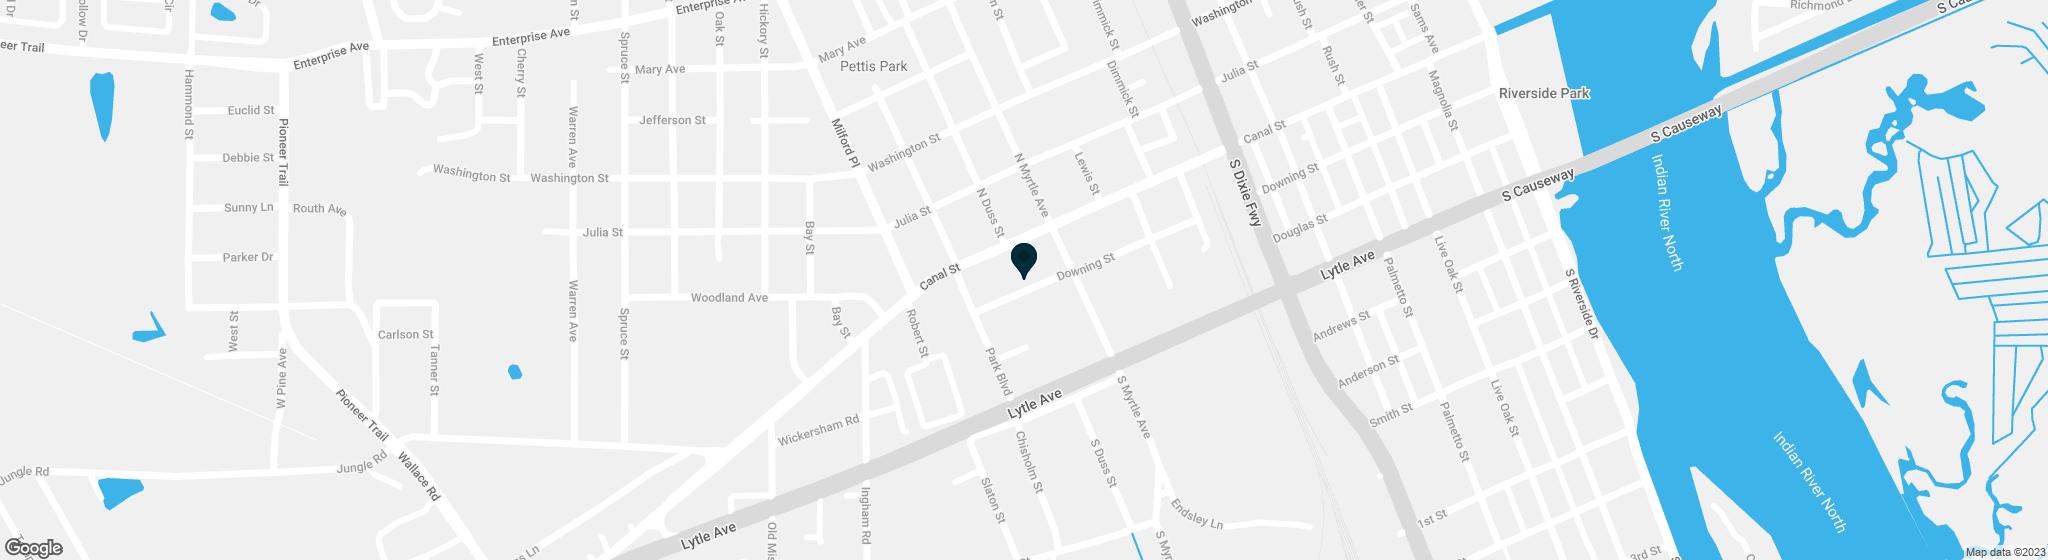 815 Downing Street New Smyrna Beach FL 32168